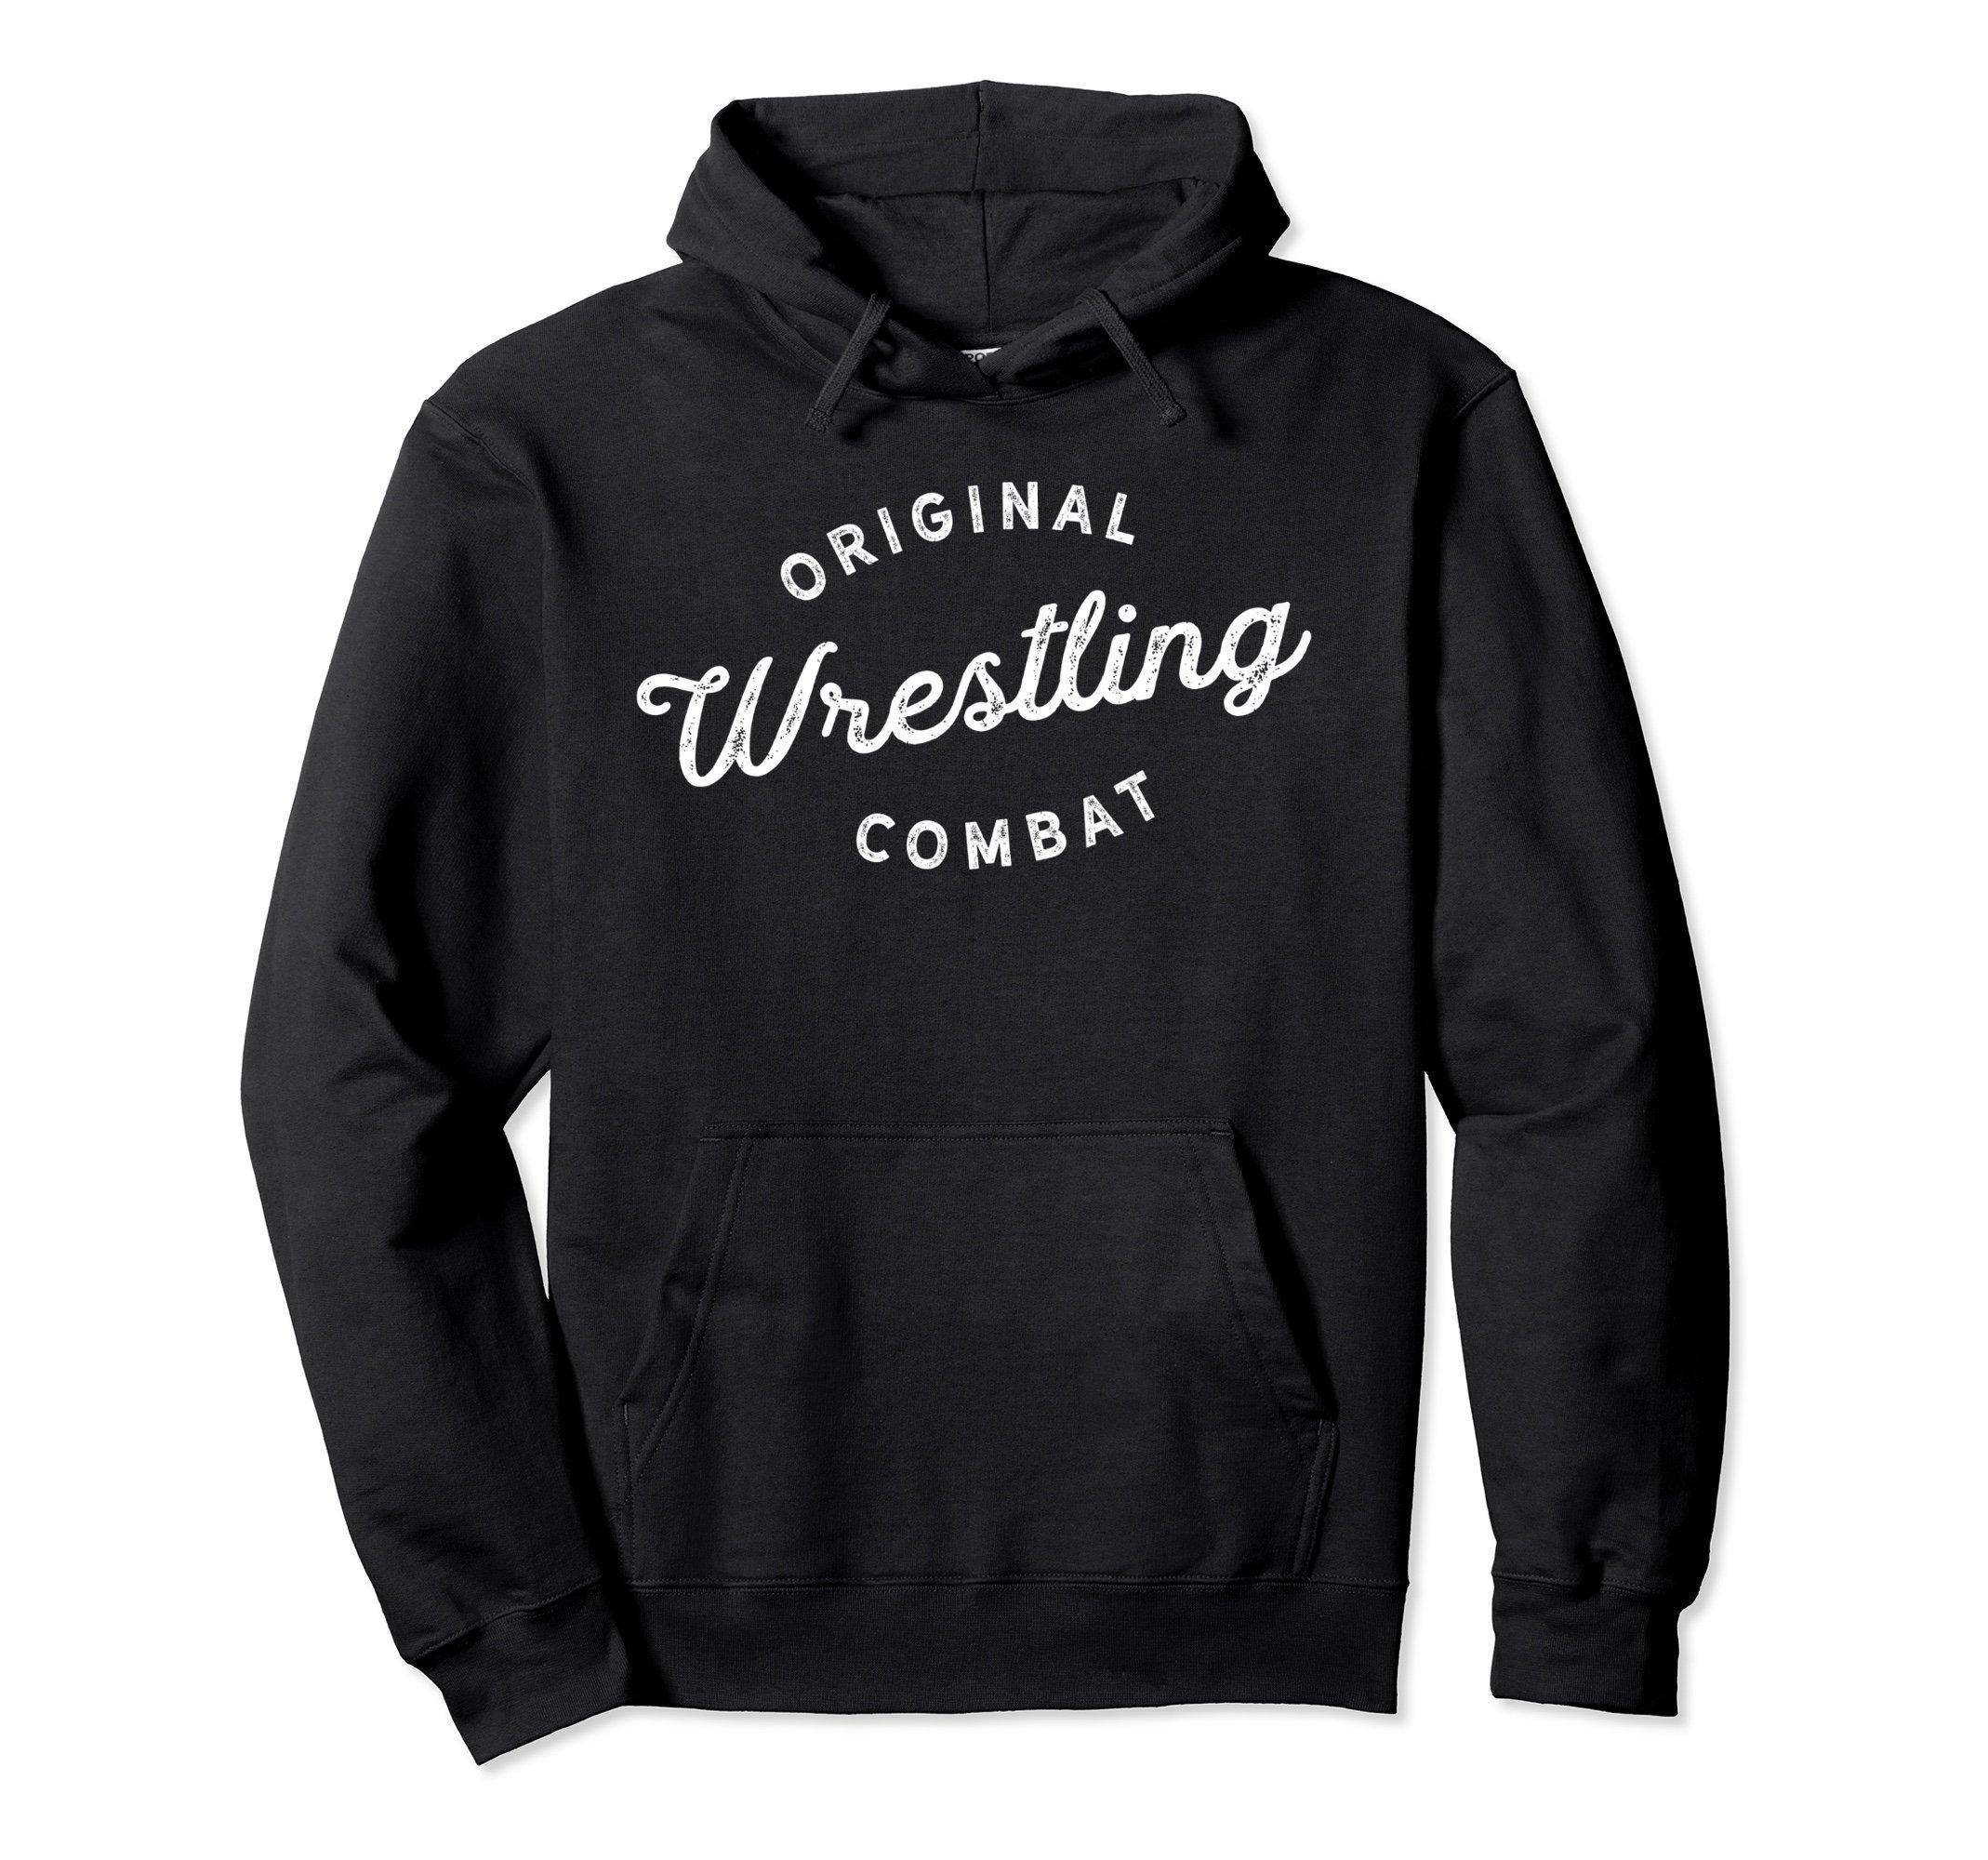 Unisex Original Combat Wrestling Hoodie for Wrestlers, Gift, White Medium Black by Wrestling Shirts and Wrestling Shoes